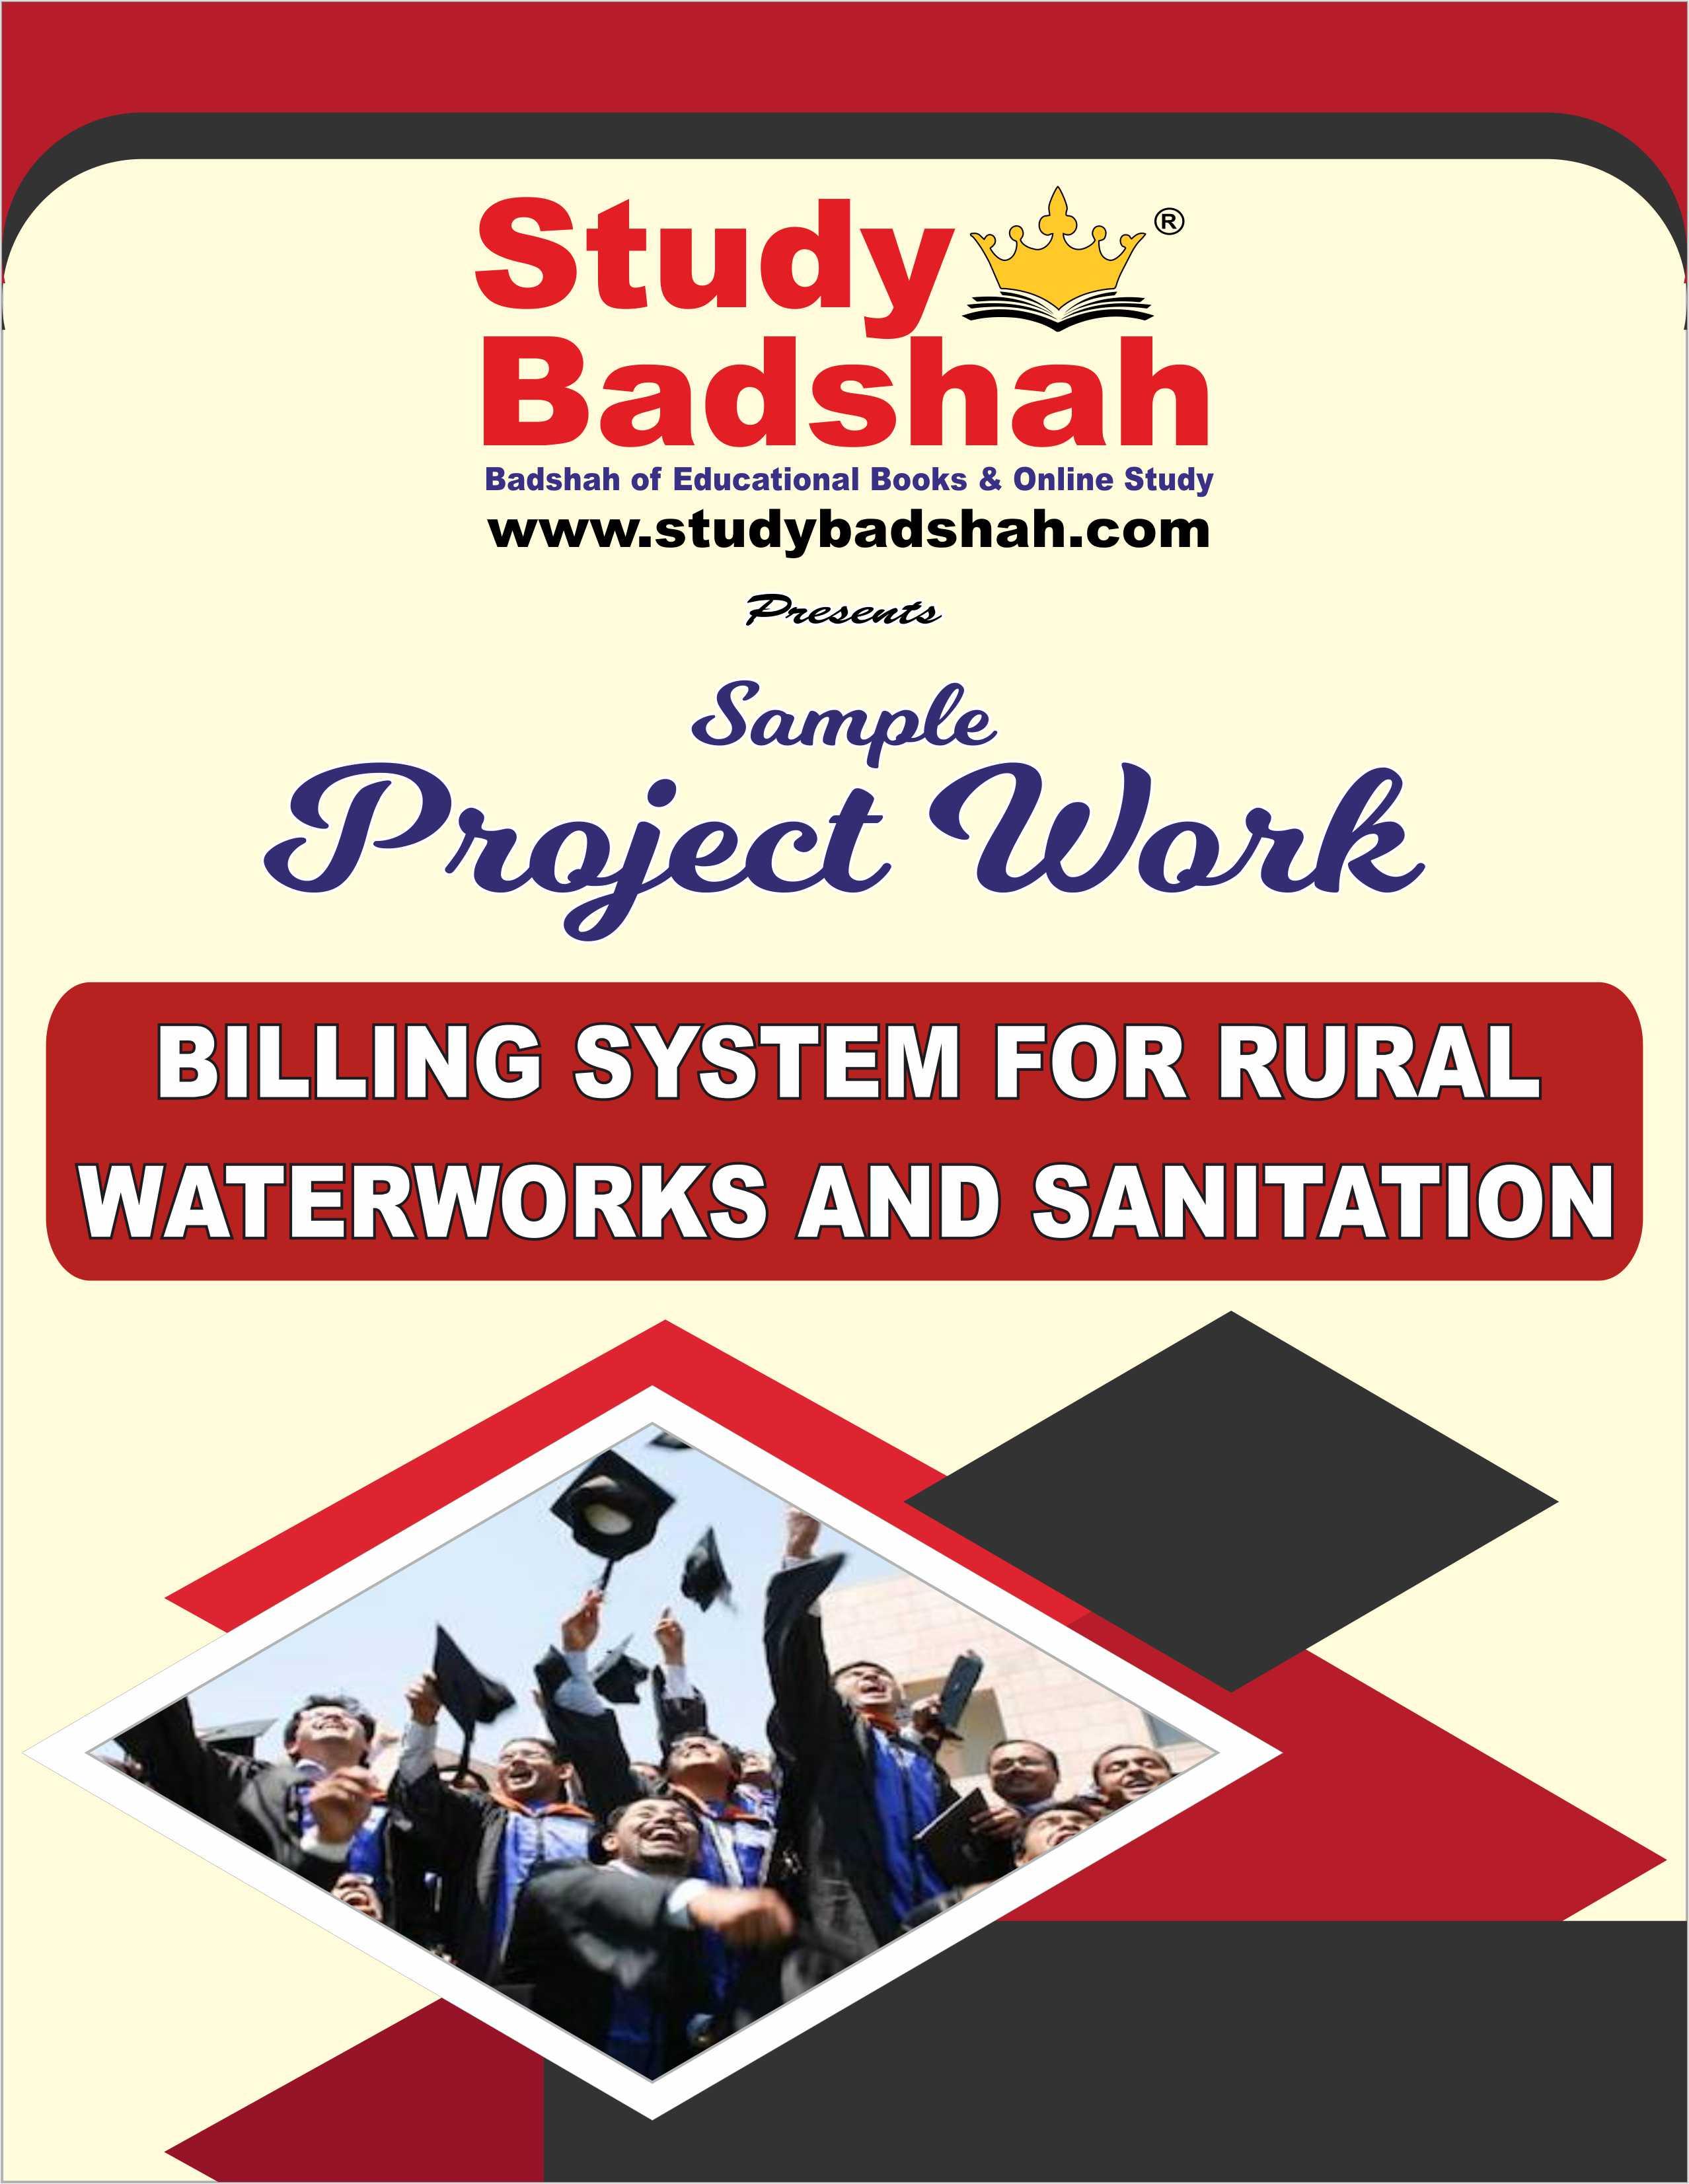 BILLING SYSTEM FOR RURAL WATERWORKS AND SANITATION